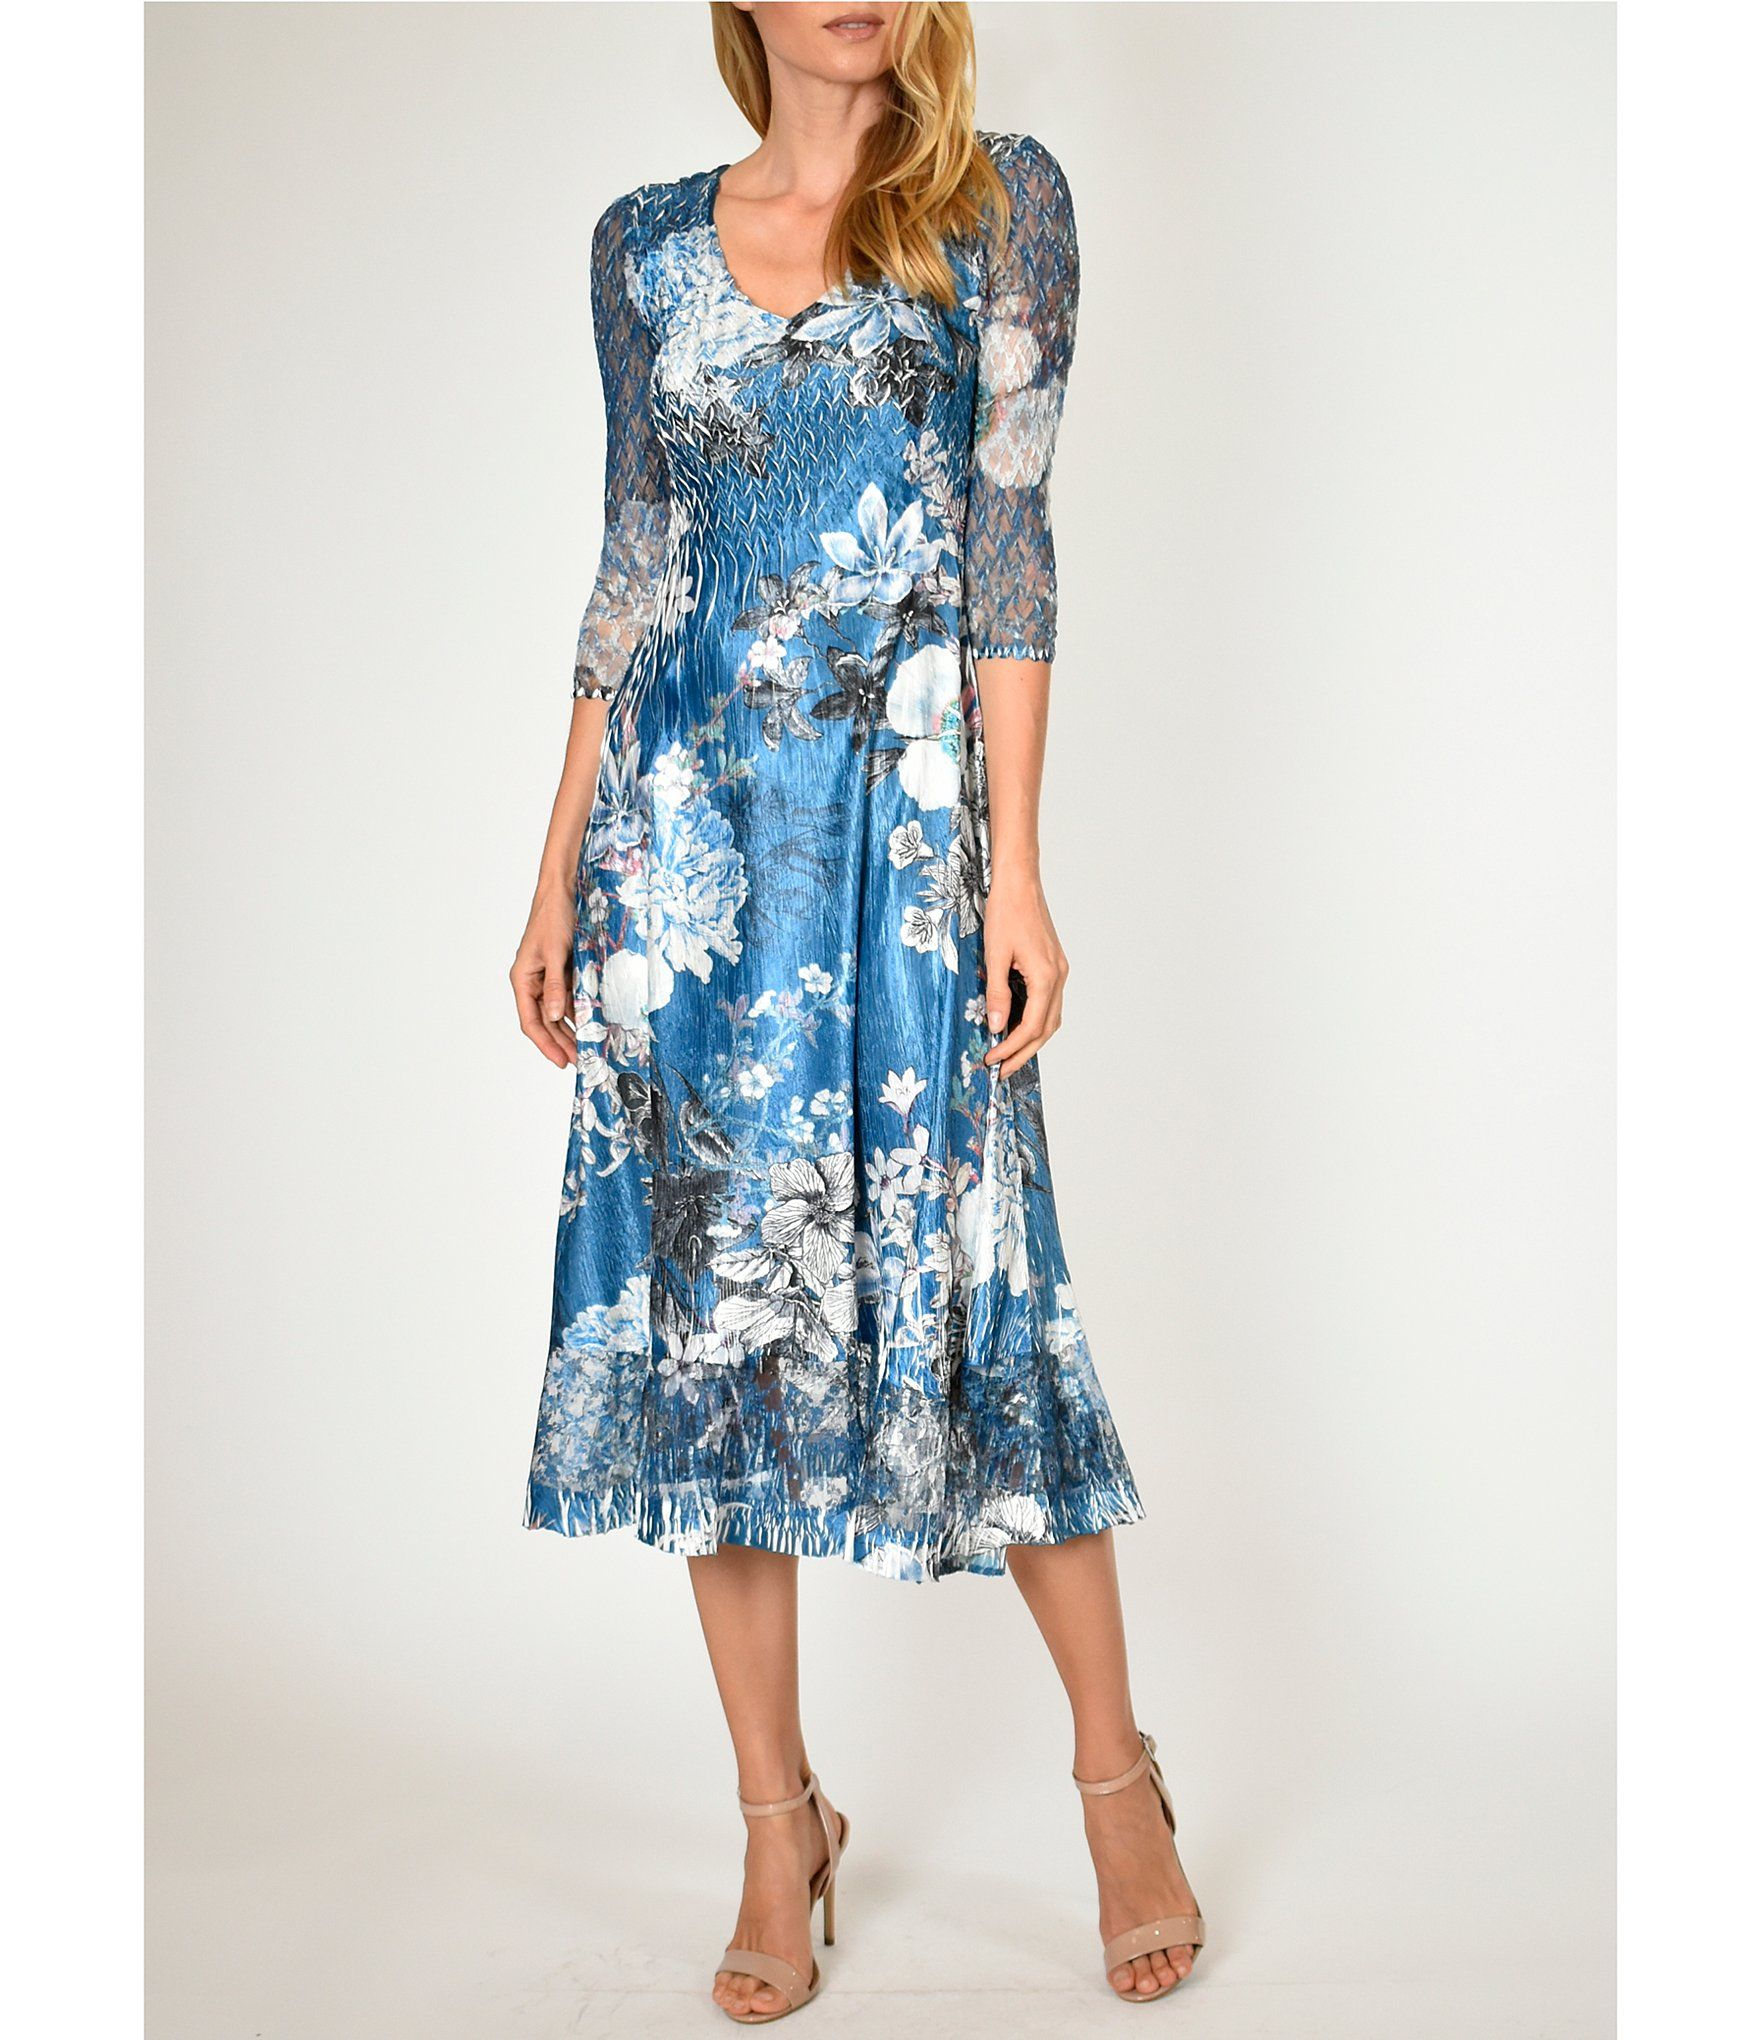 Komarov Bouquet Floral V Neck 3 4 Sheer Sleeve Midi Dress Dillard S Midi Dress With Sleeves Womens Midi Dresses Fashion Clothes Women [ 2040 x 1760 Pixel ]